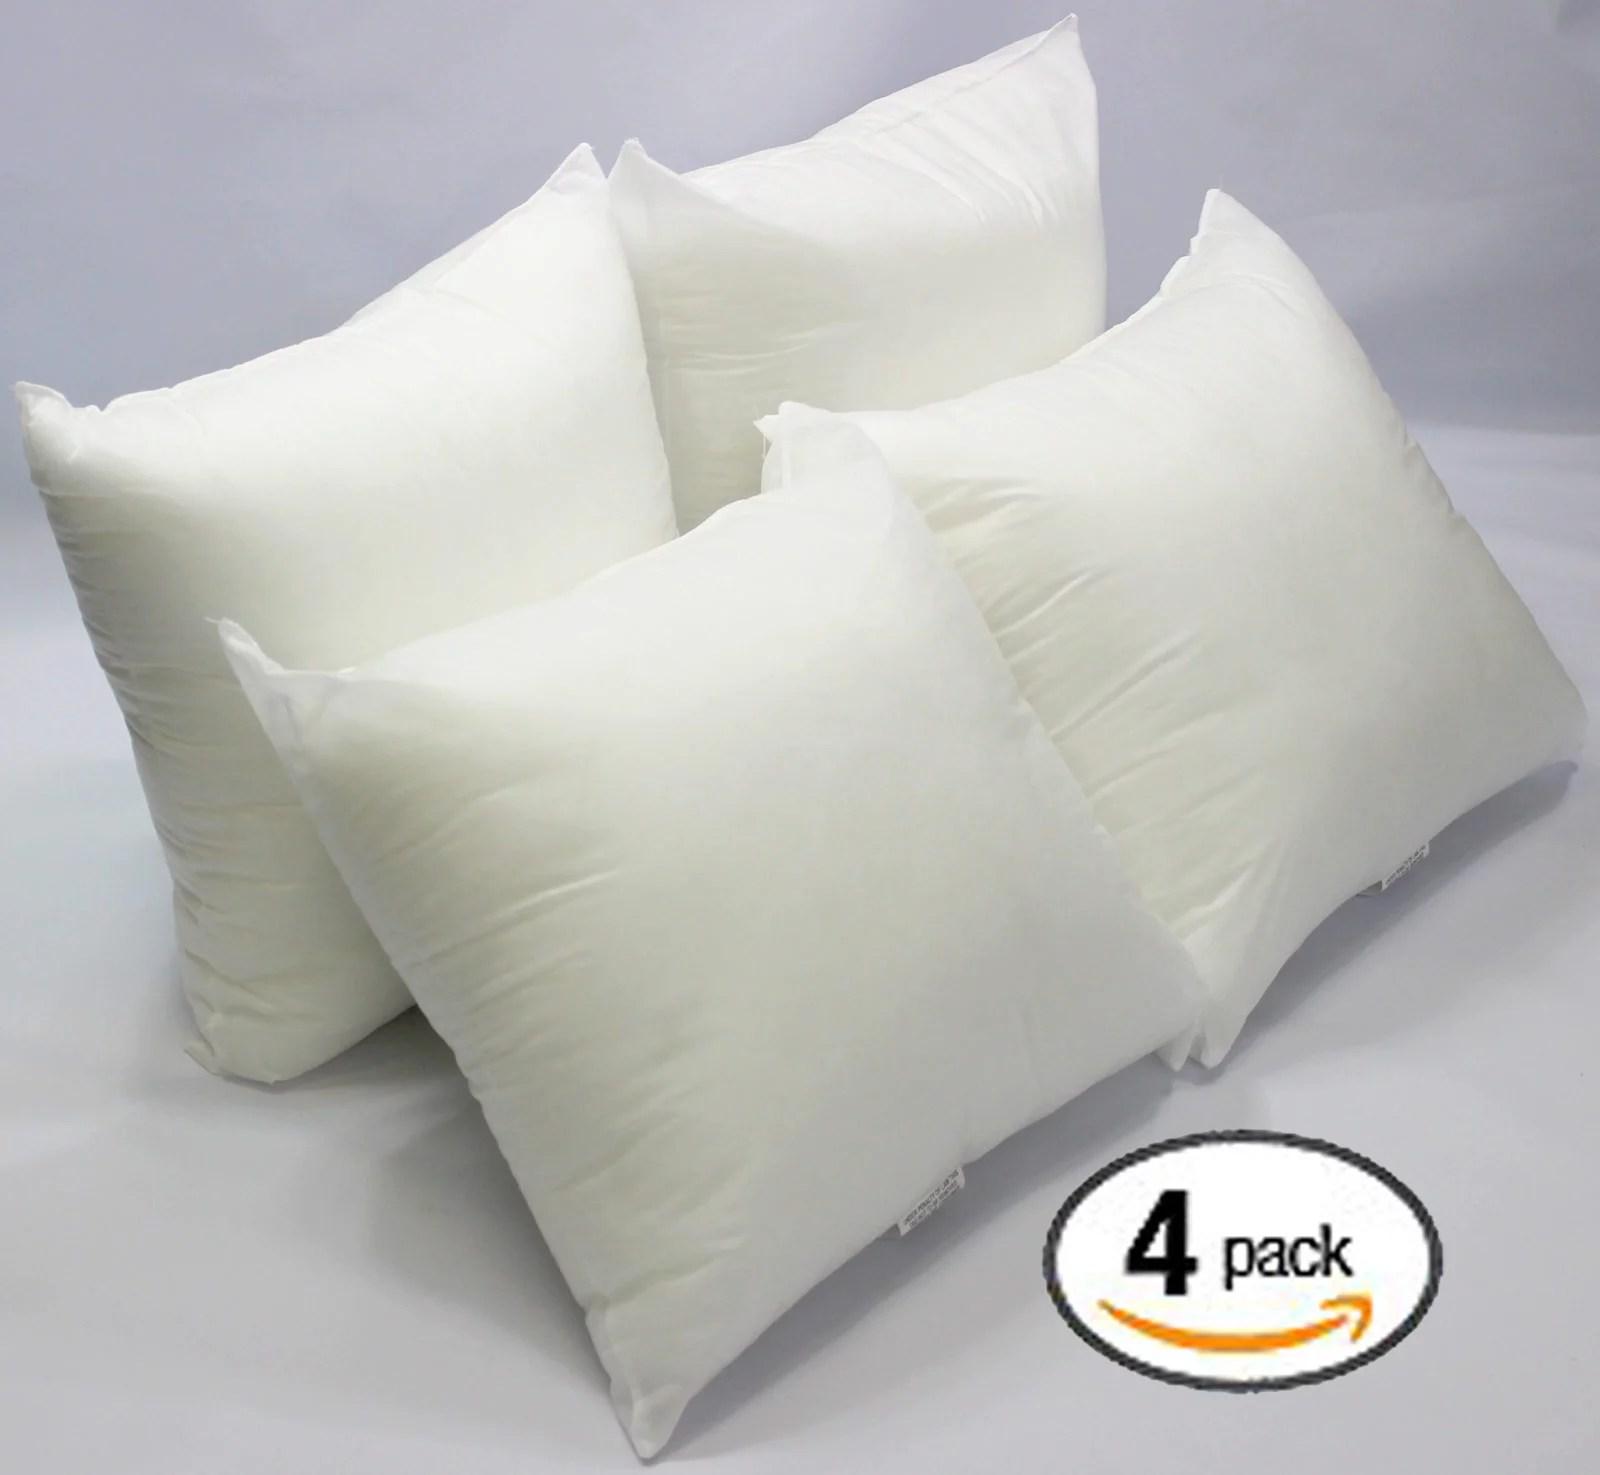 set of 4 18 x 18 premium hypoallergenic stuffer pillow insert sham square form polyester standard white made in usa walmart com